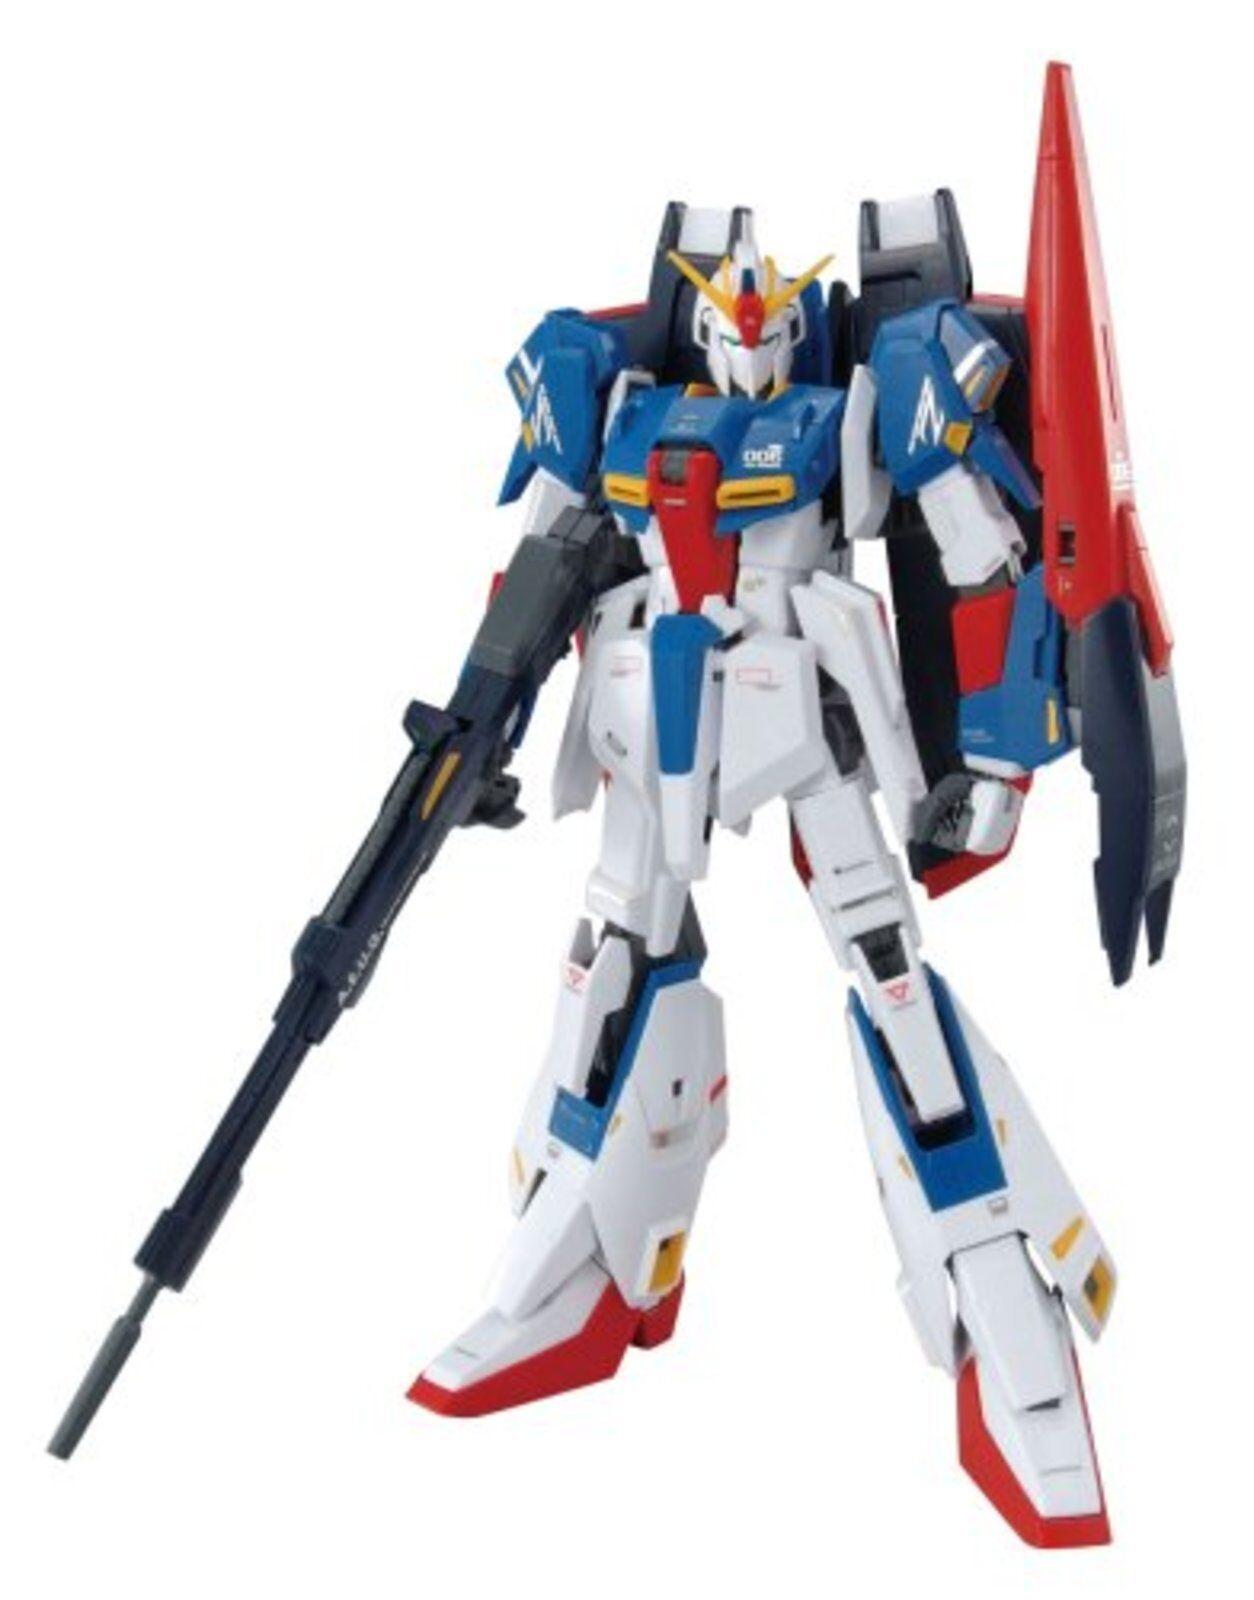 MG 1 100 Msz-006 Zeta Gundam Ver.2.0 HD color ( Móvil Compatible Z Gundam) F S